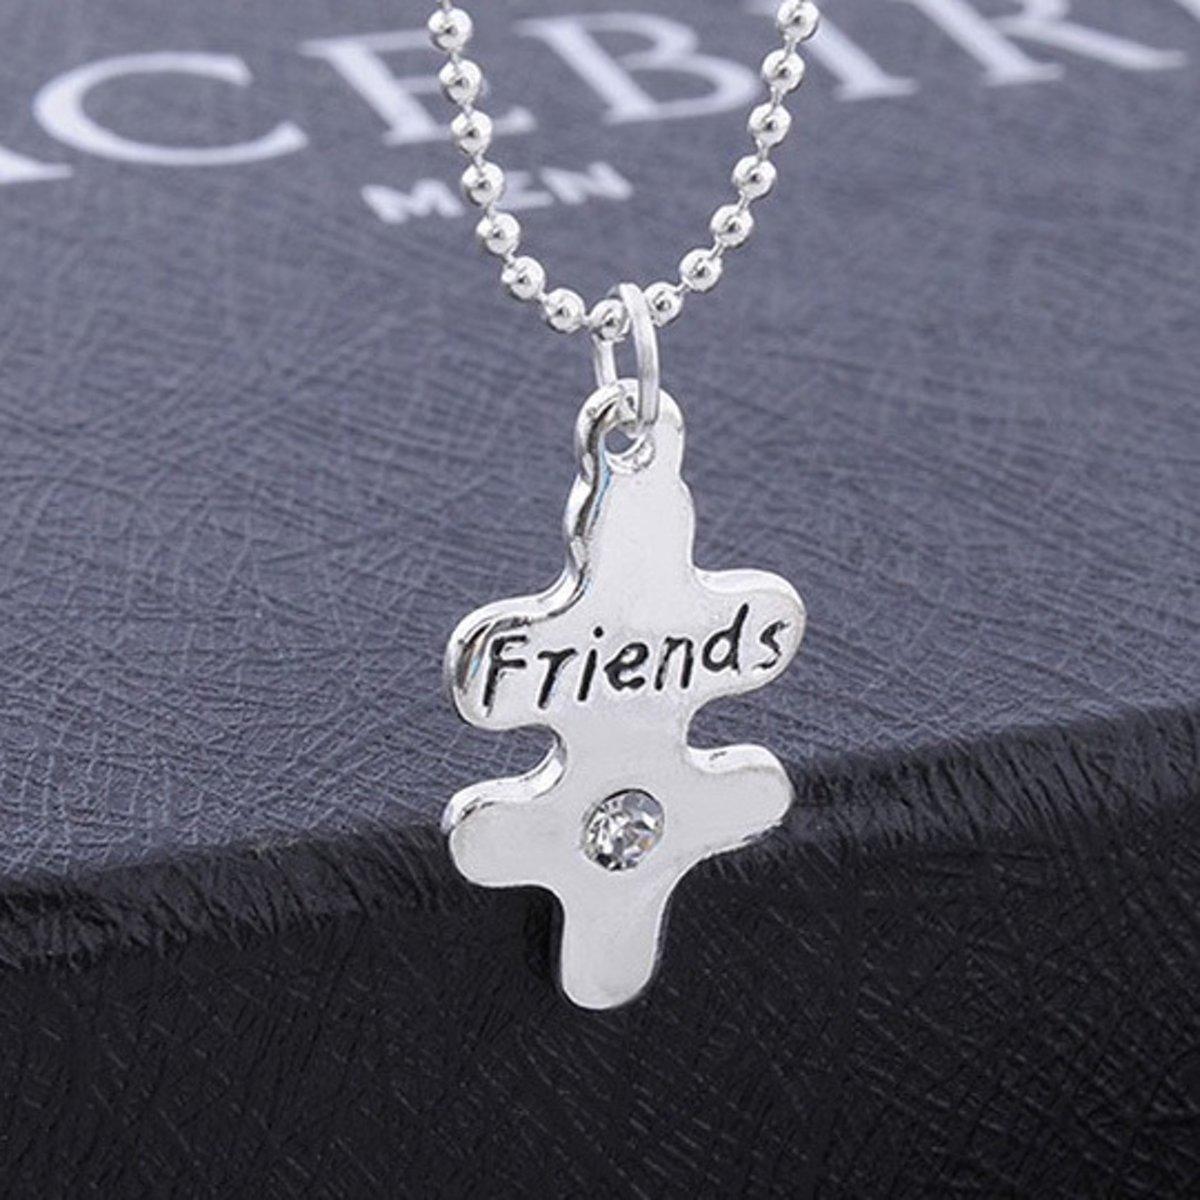 bol.com | BFF Ketting hartje voor 3 - Best Friends Forever - zilver